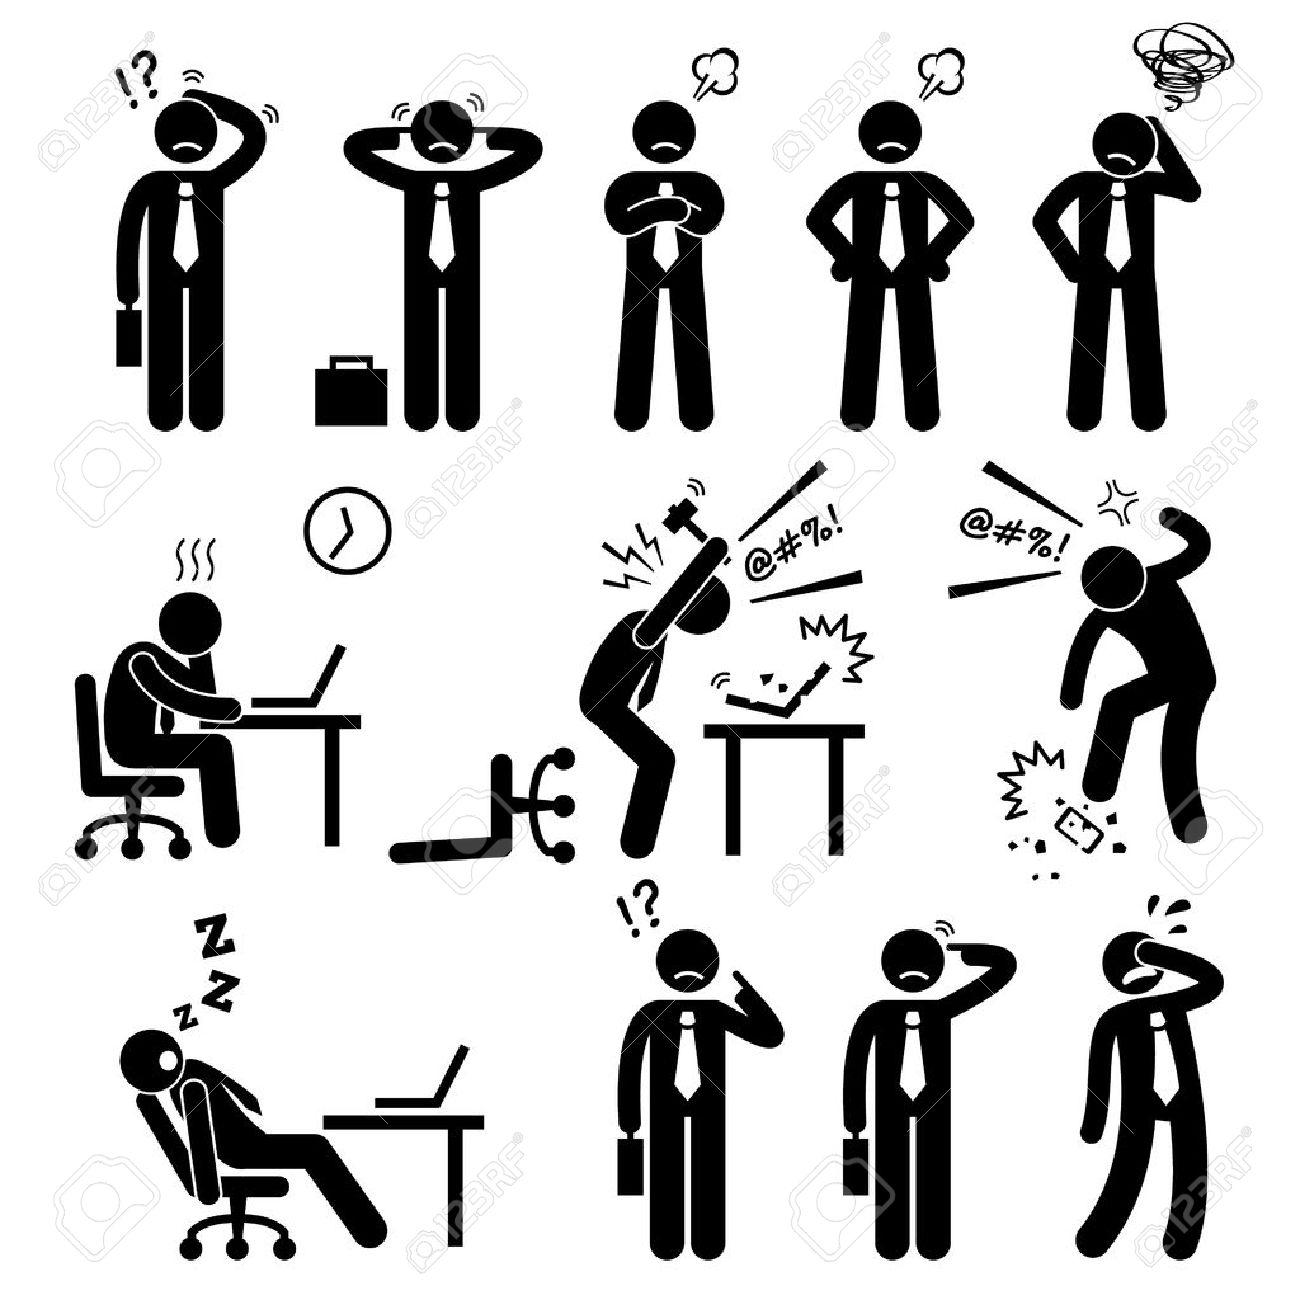 Businessman Business Man Stress Pressure Workplace Stick Figure Pictogram Icon - 38116502